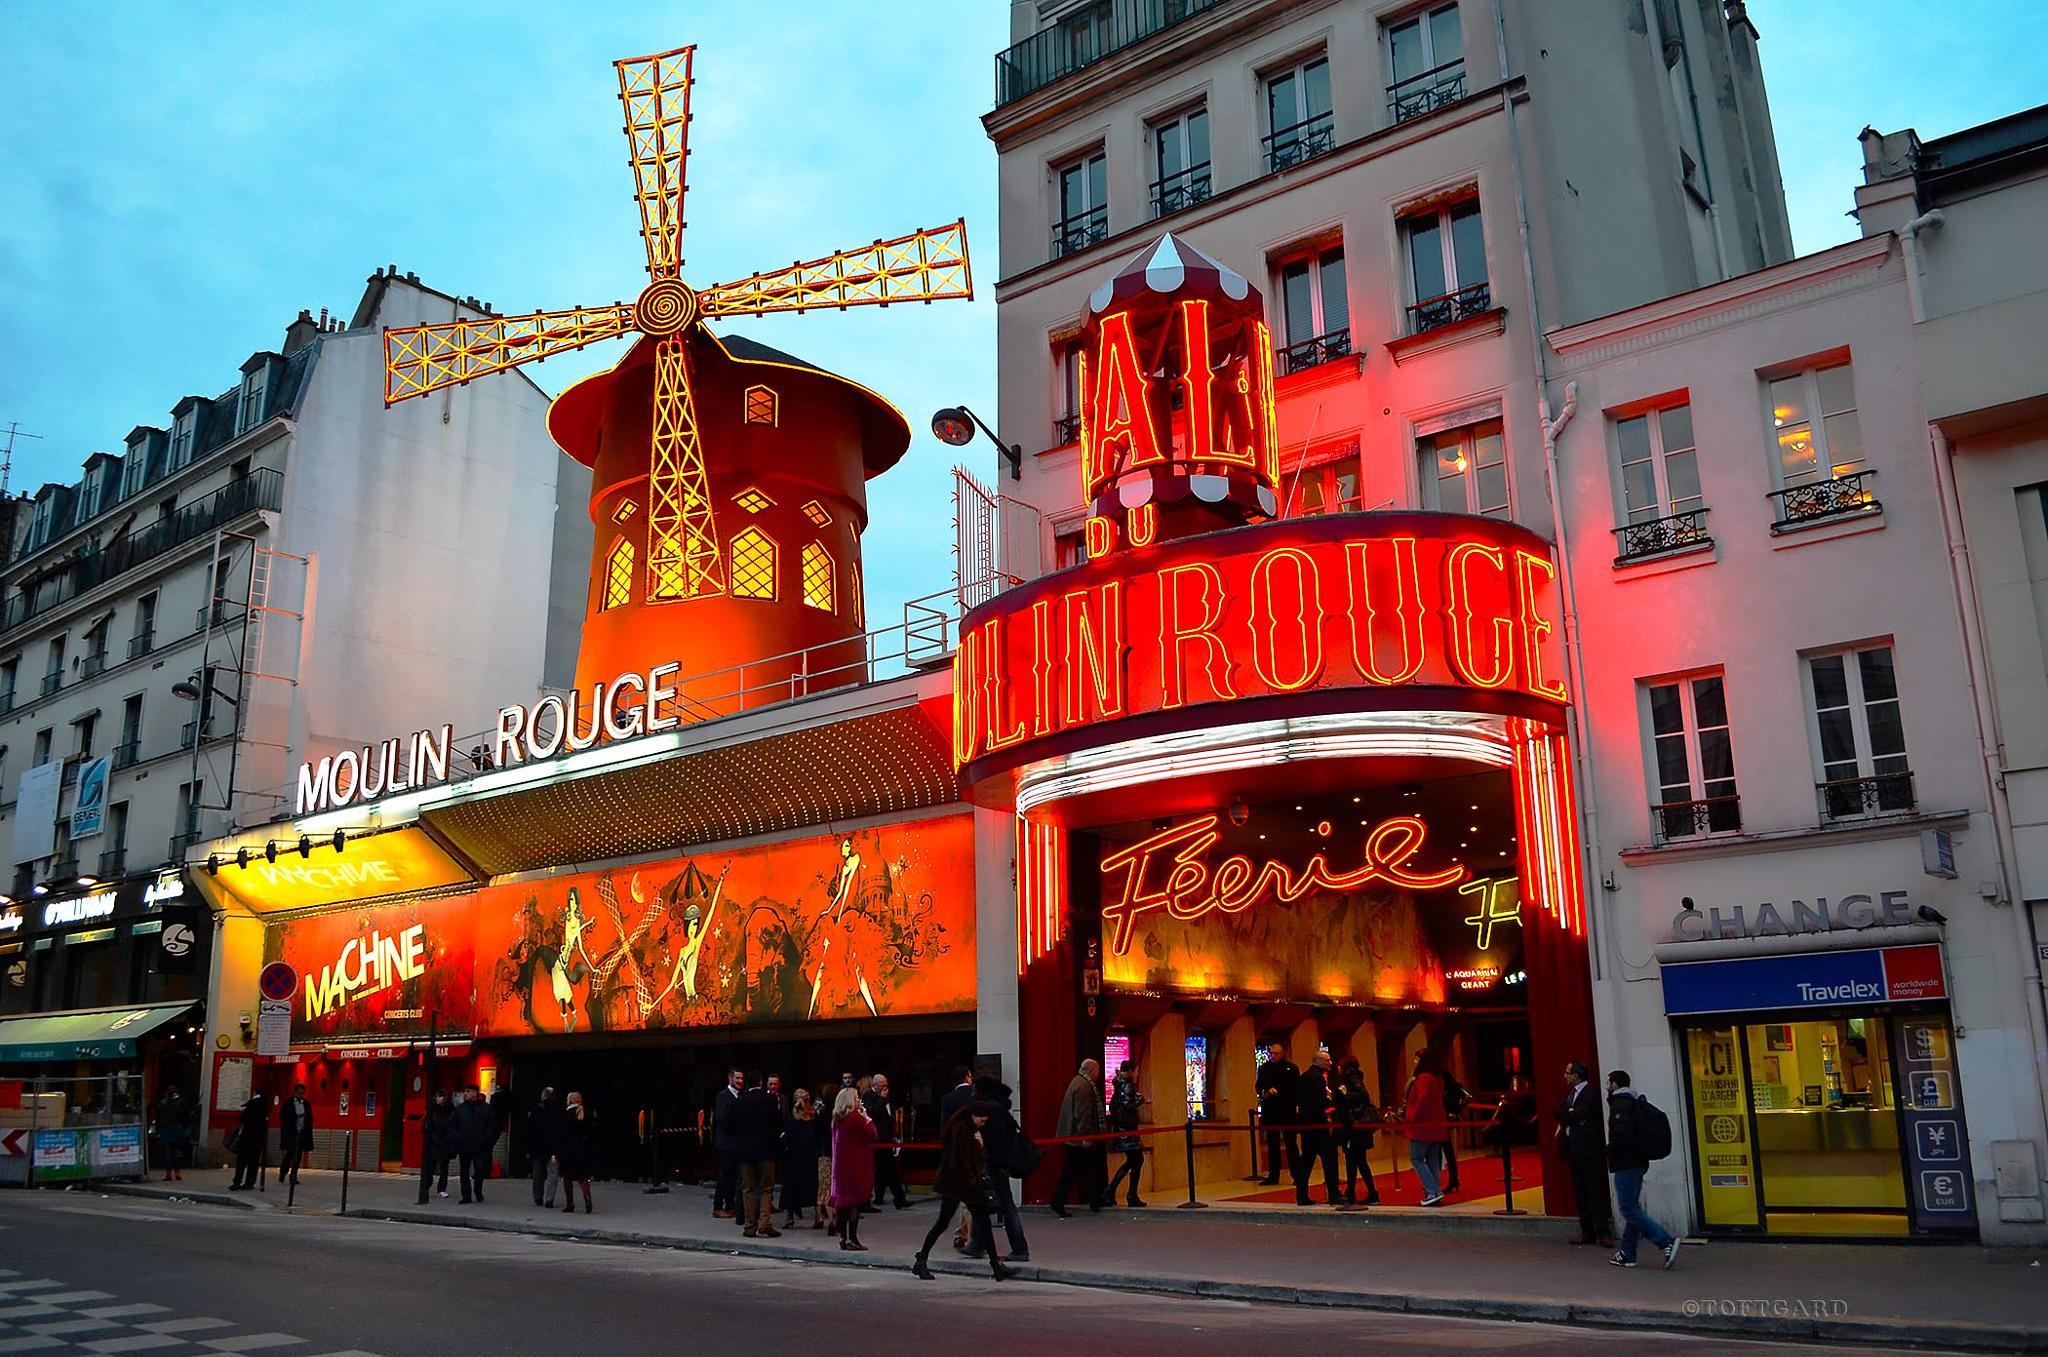 Moulin Rouge, Paris by TOFTGARD